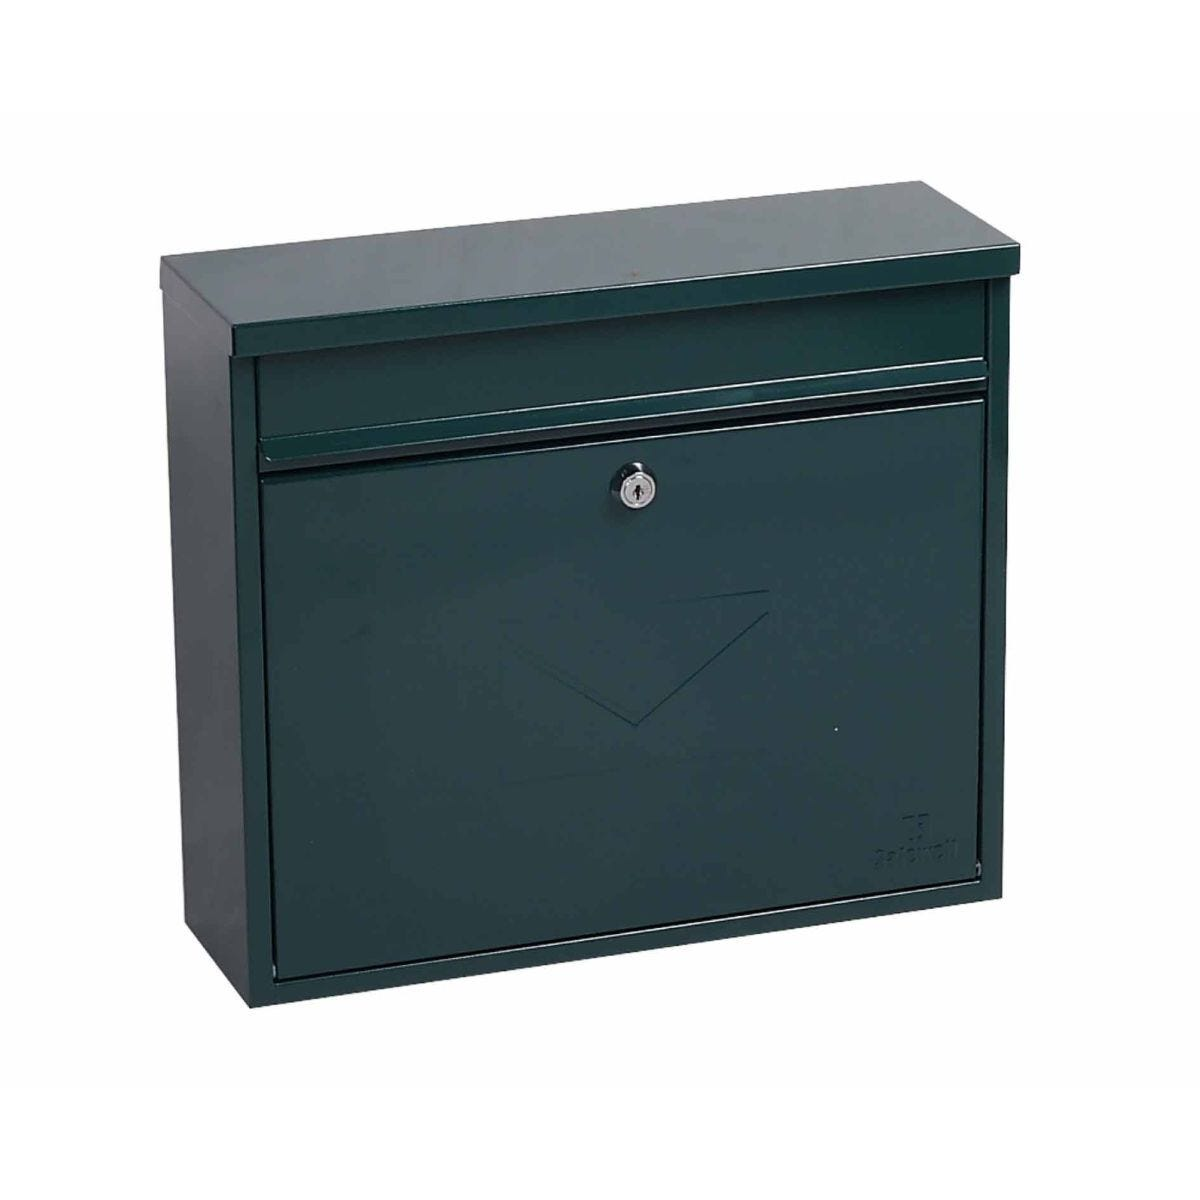 Phoenix Correo MB0118KB Front Loading Mailbox with Key Lock Green